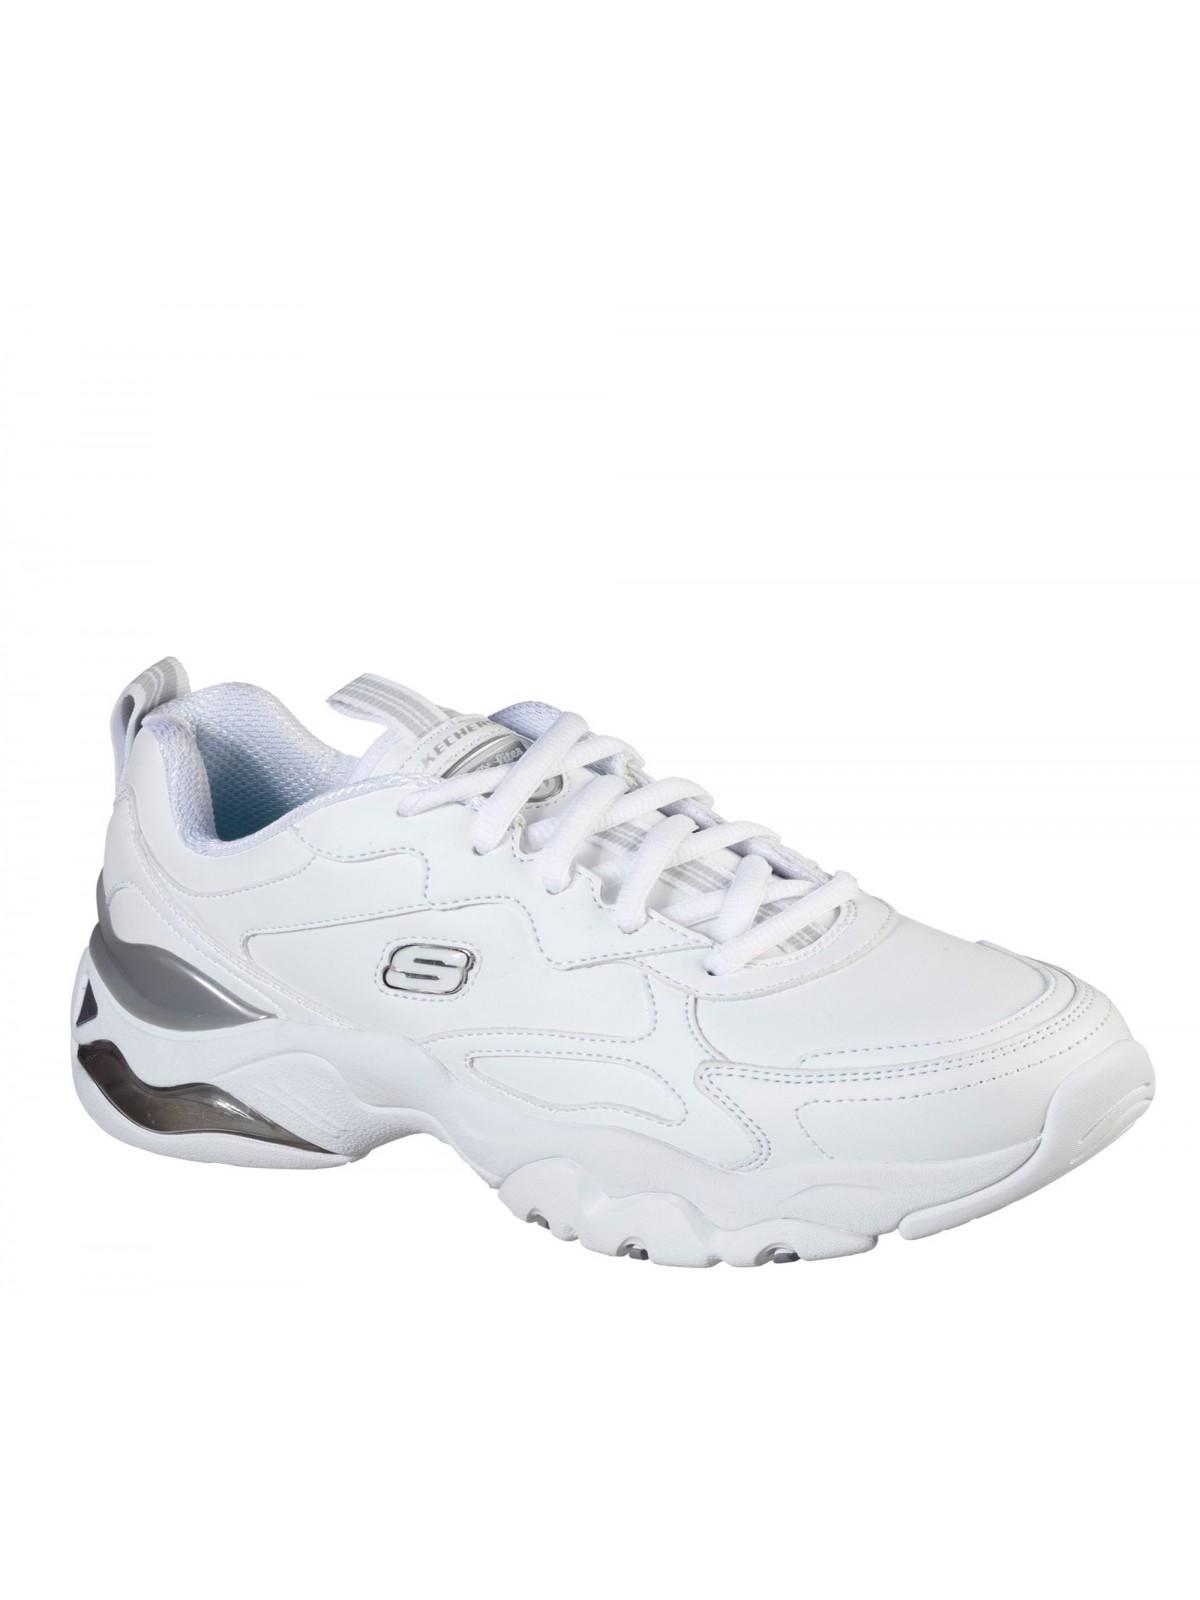 Skechers D'lites 3.0 blanc Air